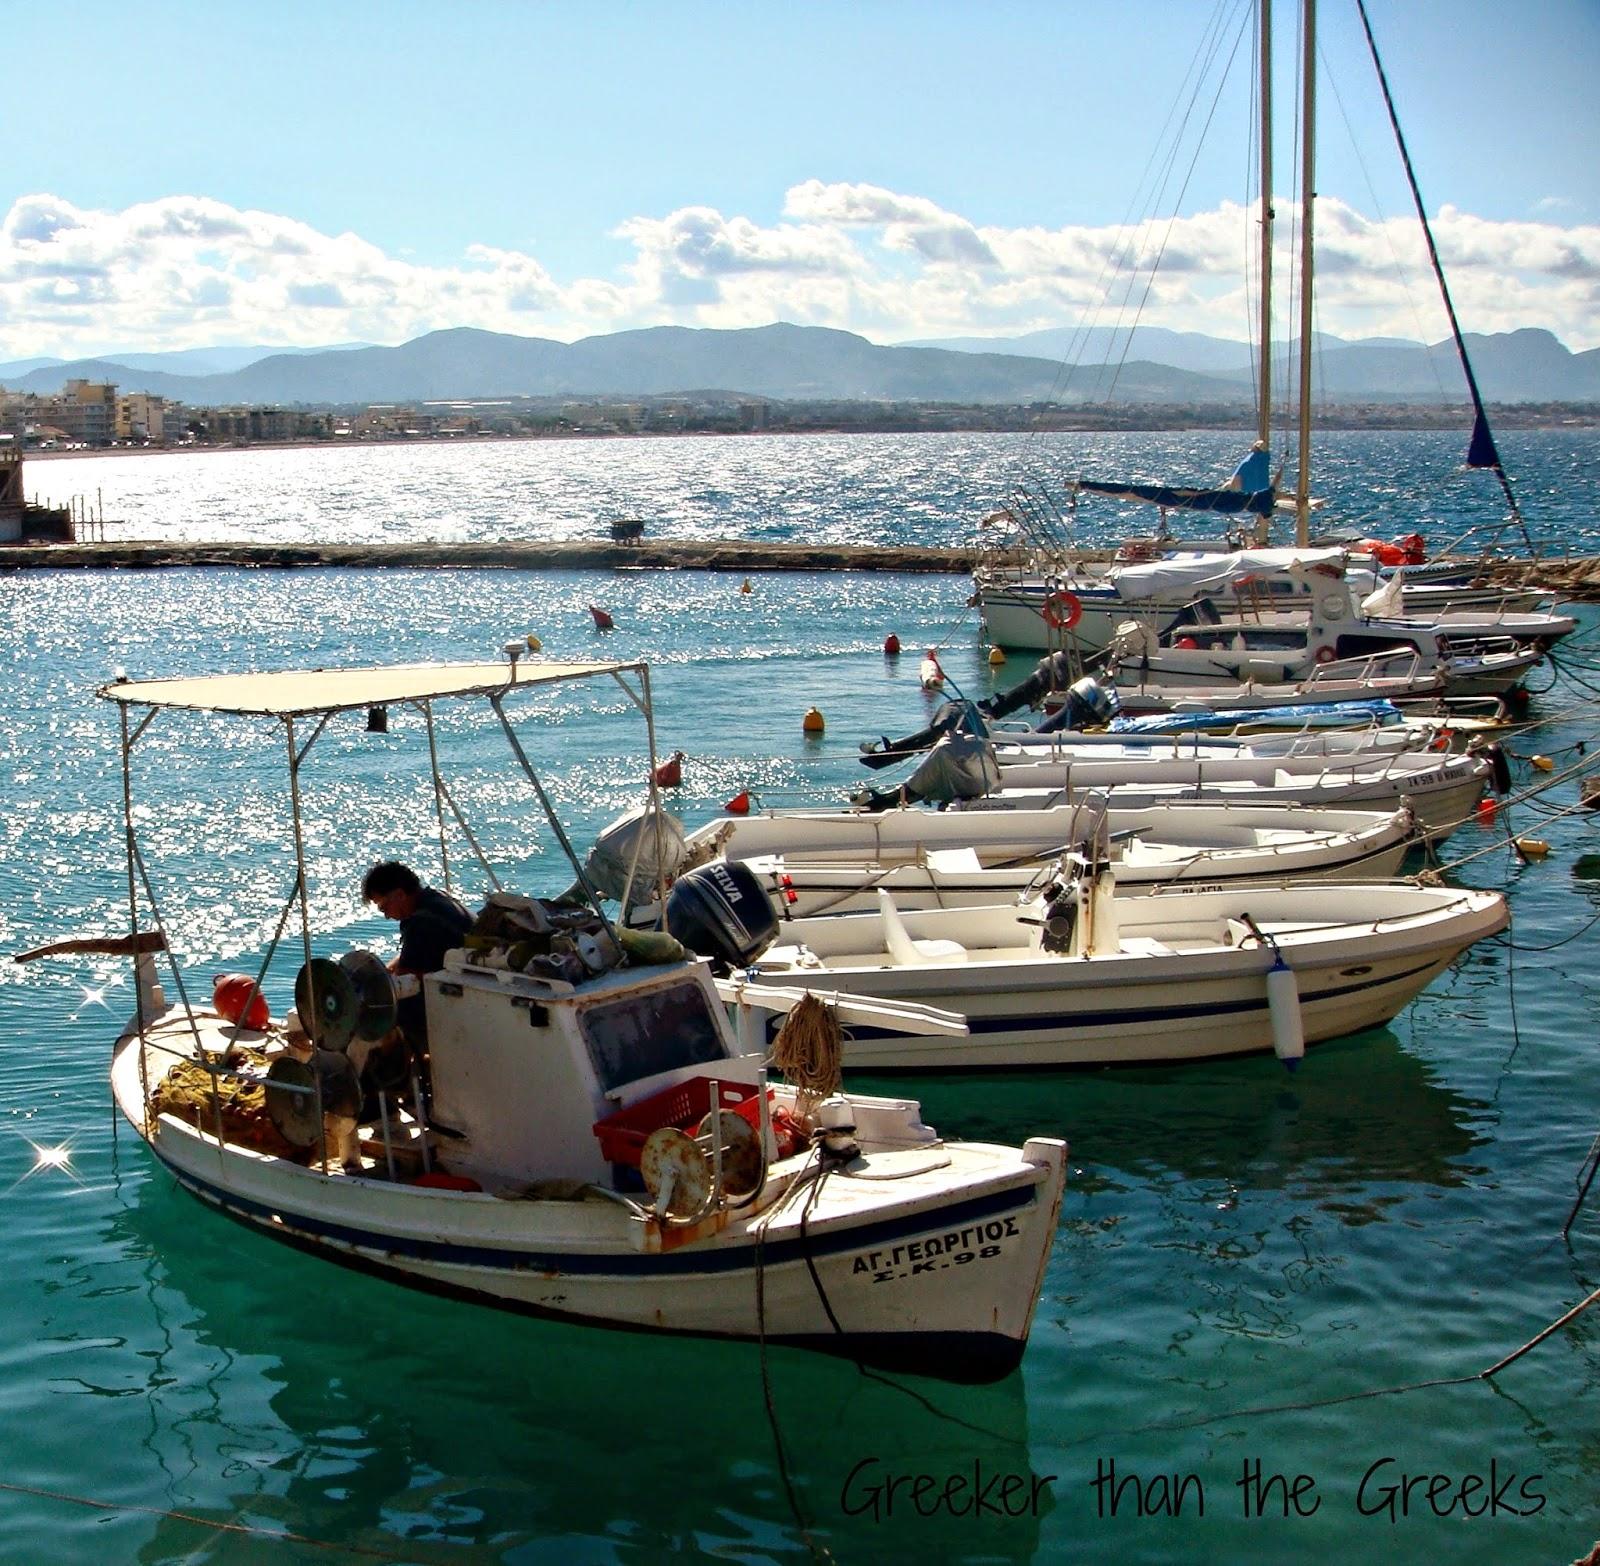 The harbour, Loutraki